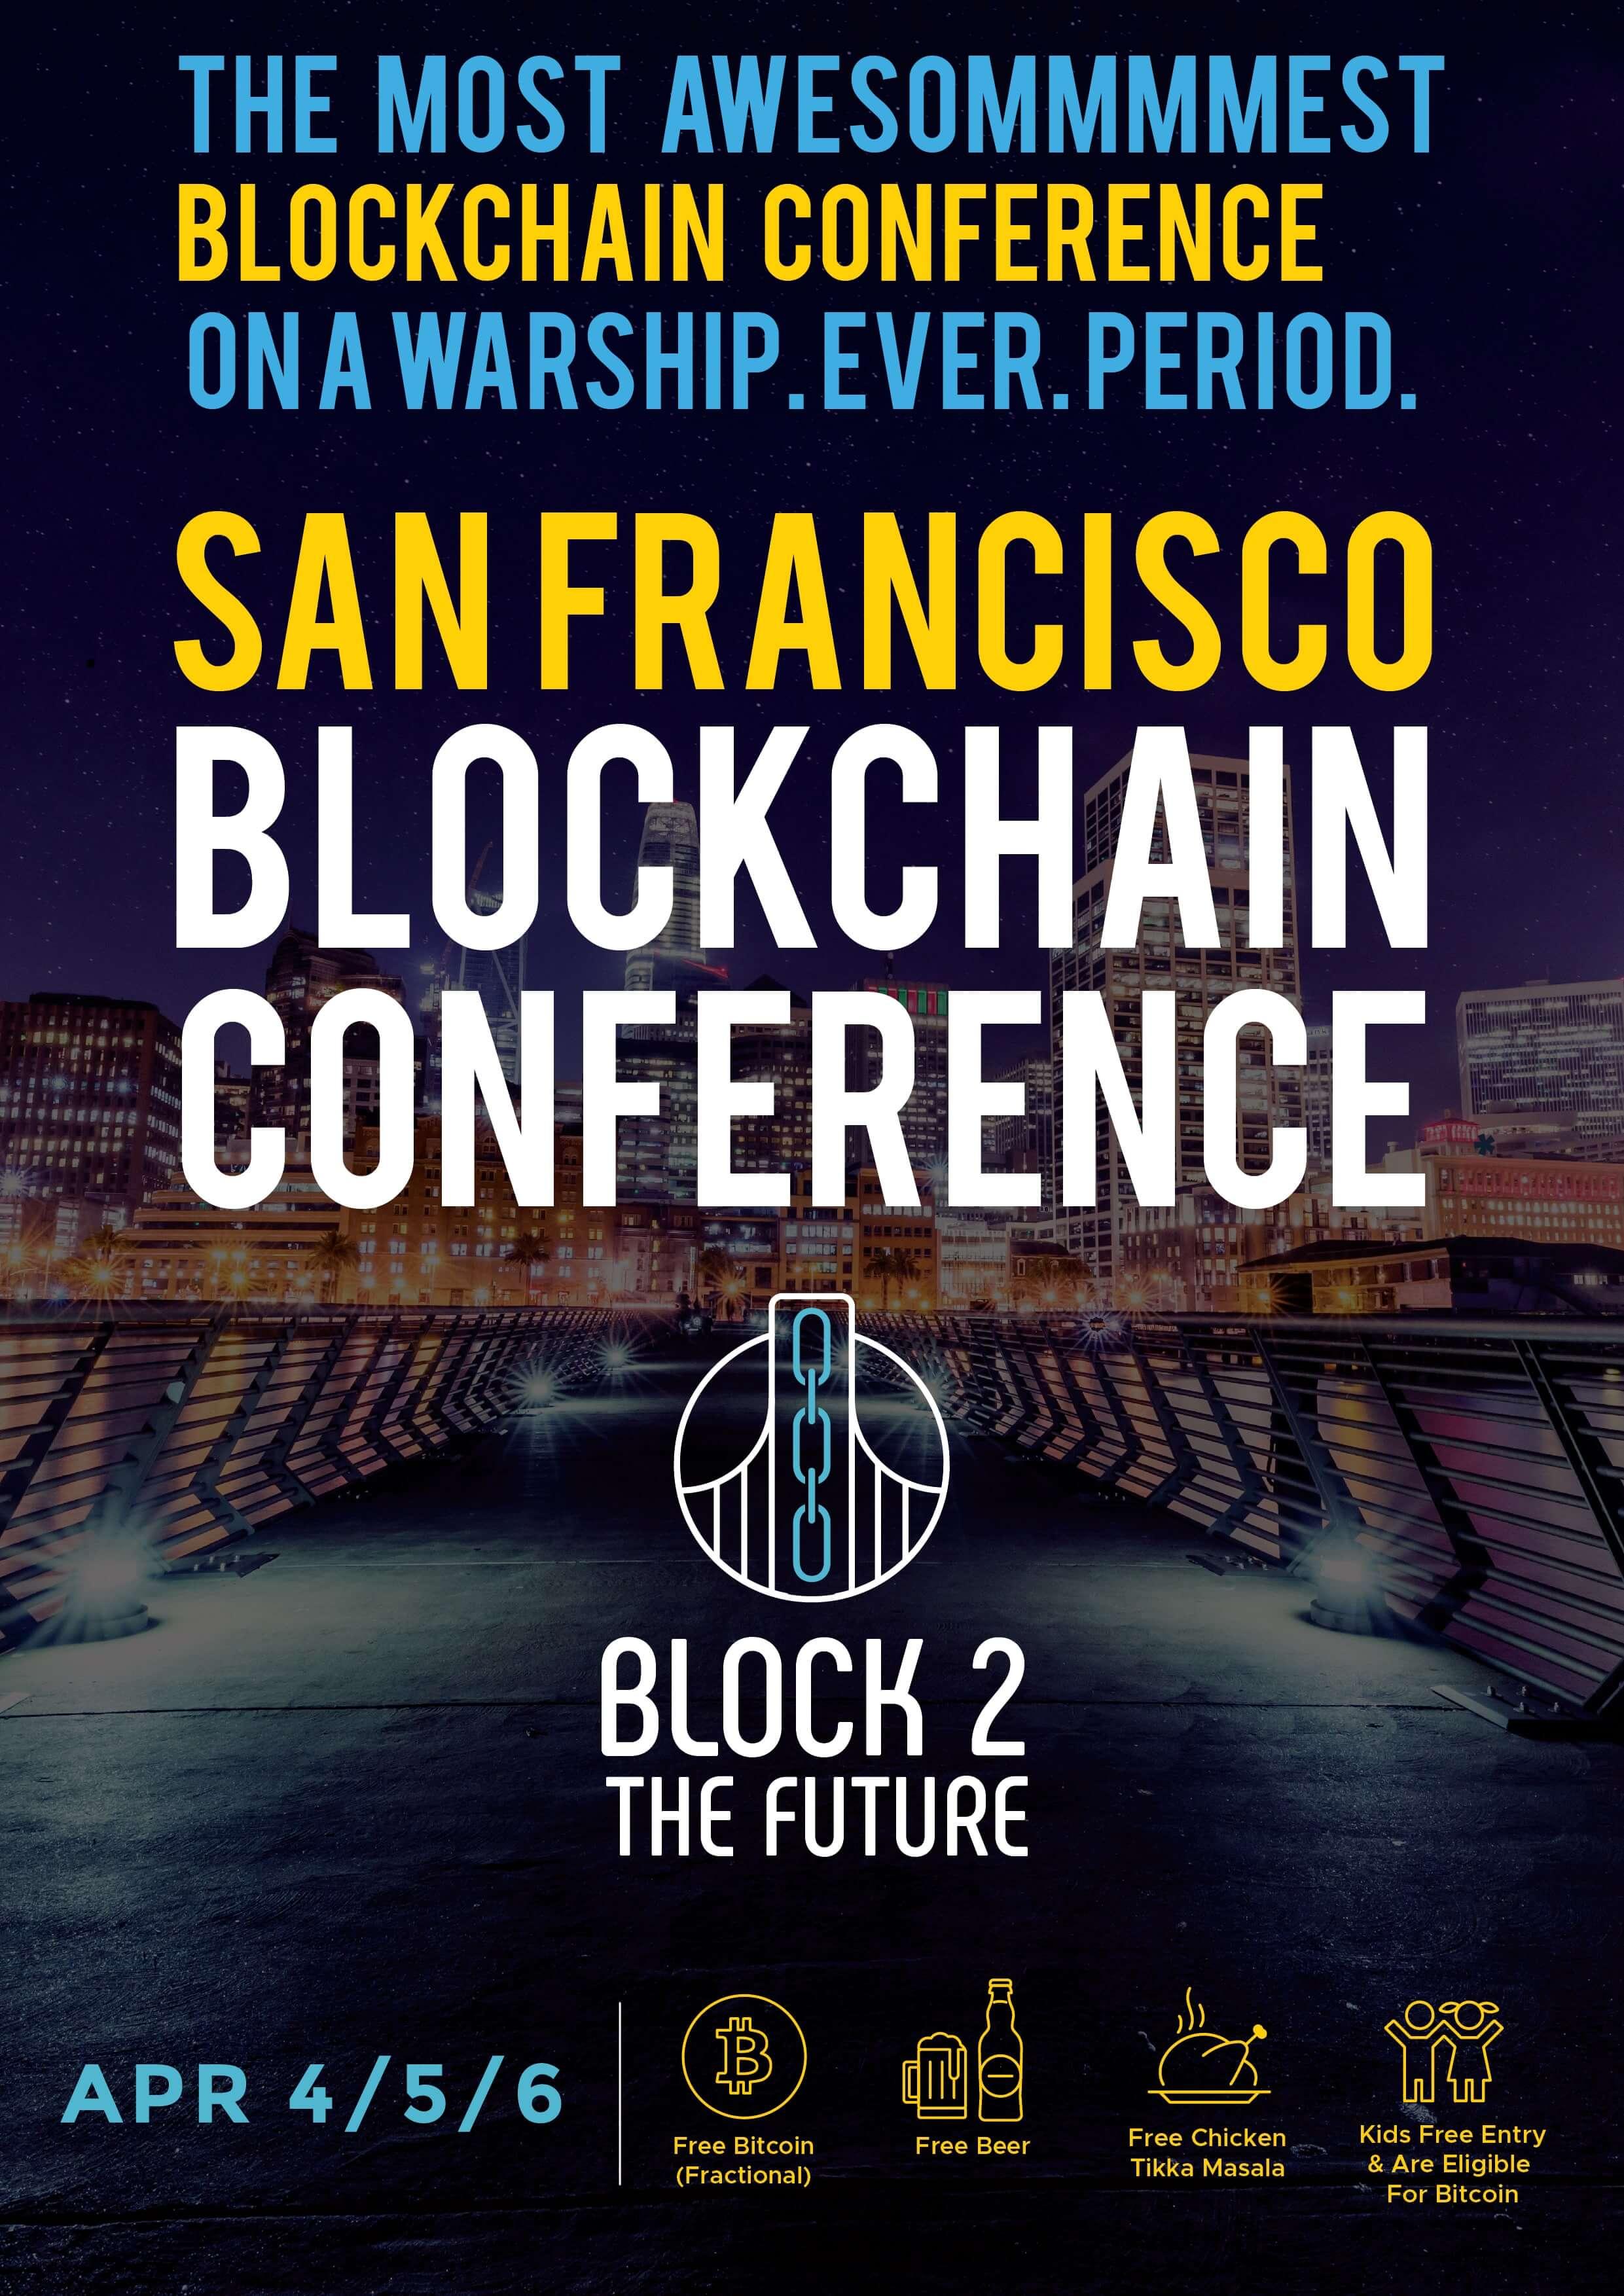 BLOCK2TheFuture Blockchain Conference - USS Hornet - Bitcoin